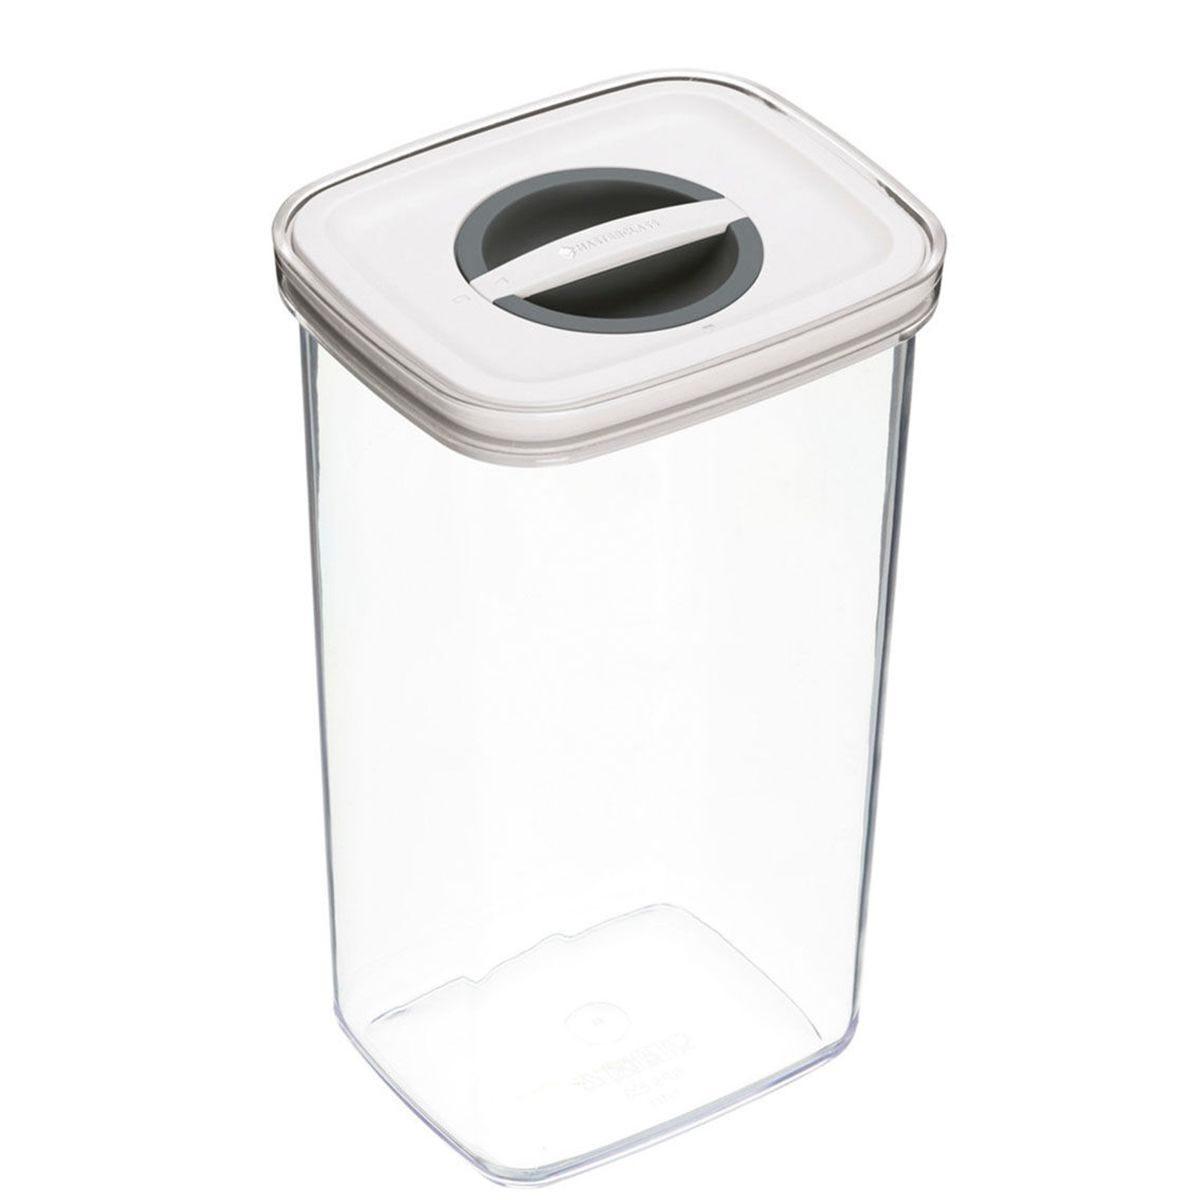 MasterClass Smart Seal Rectangular Food Container - 2.7 Litre